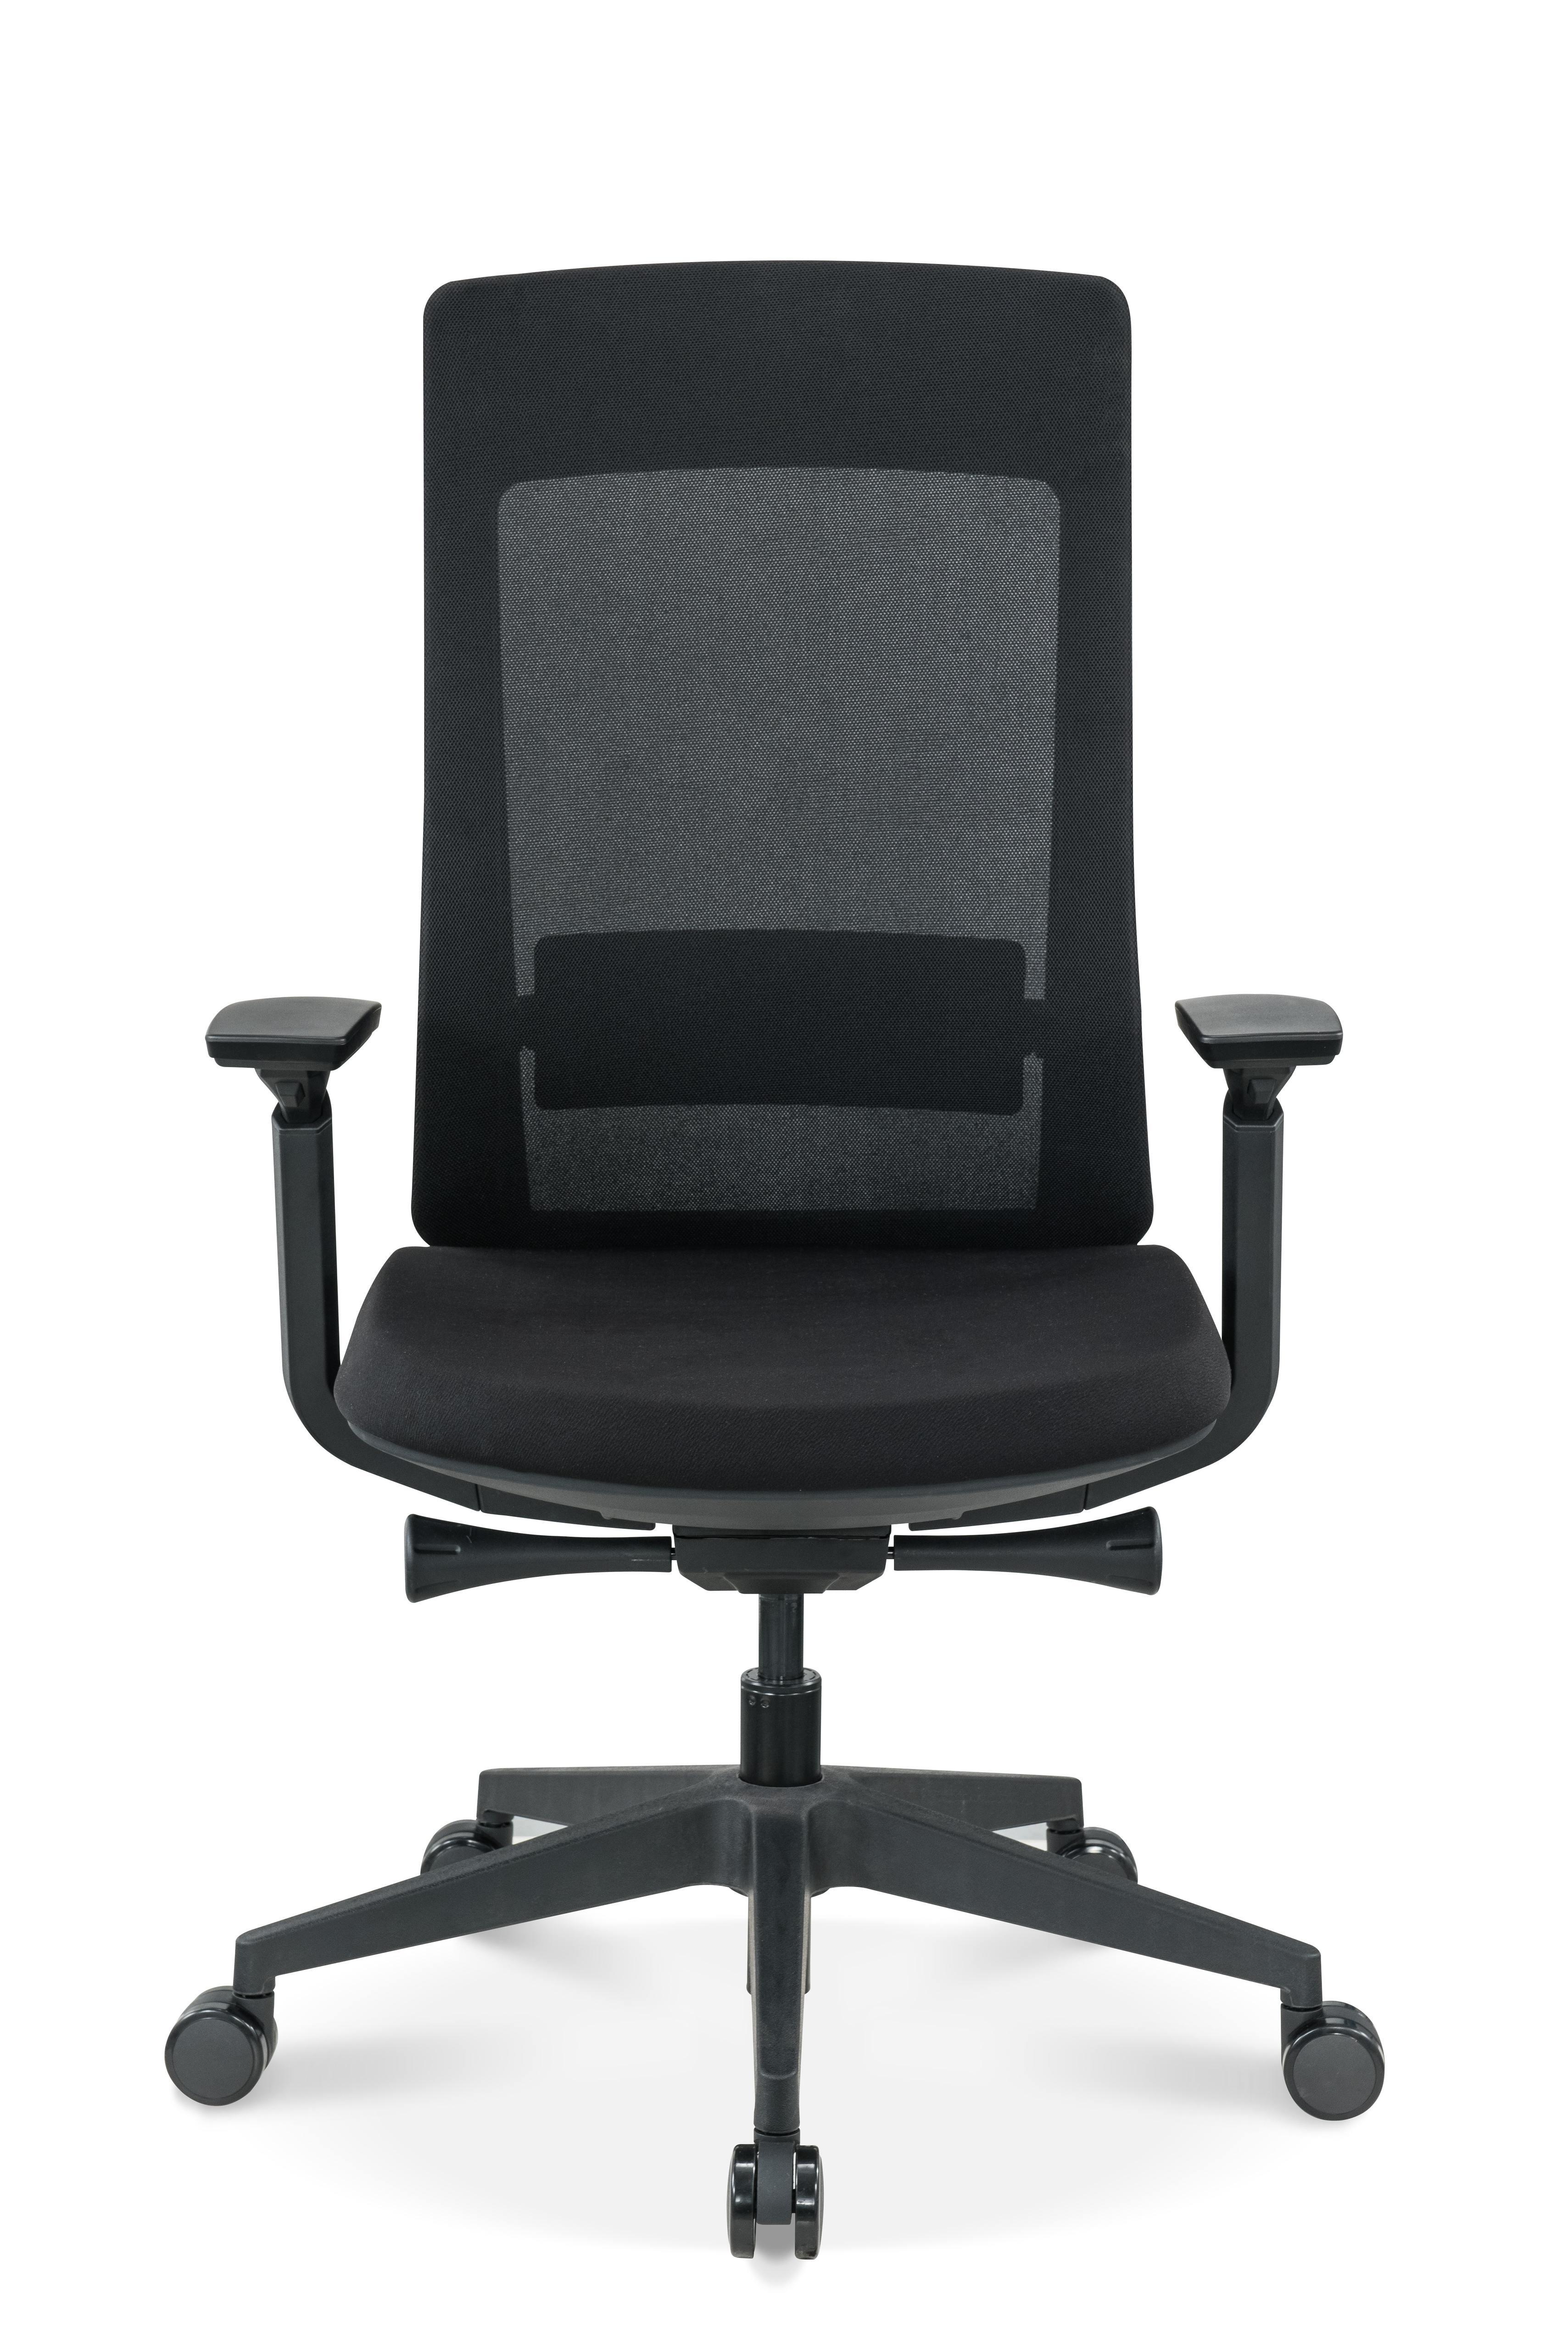 elevate mesh chair